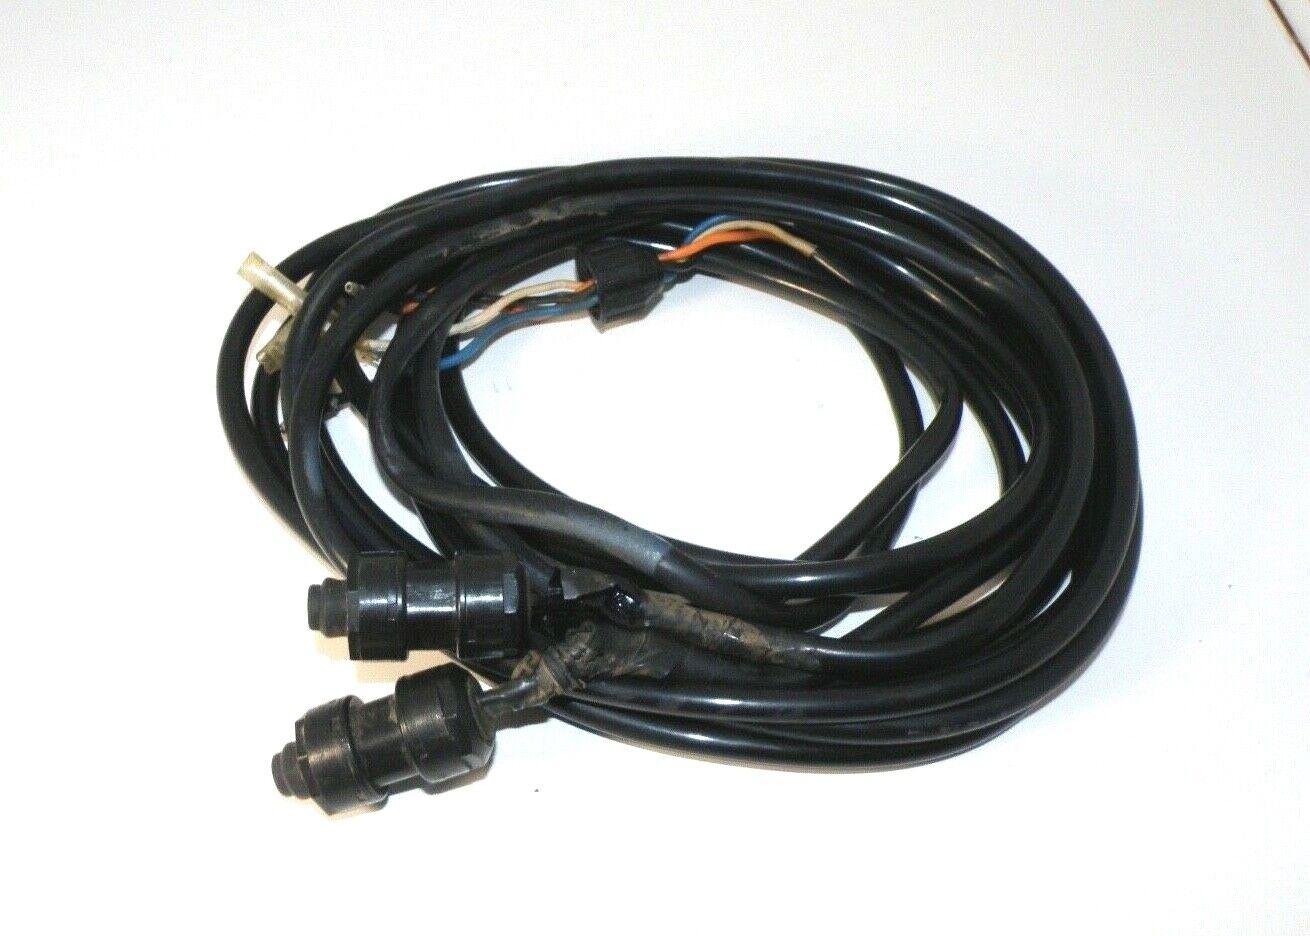 1986 Thru 1988 Kawasaki JS 300  Start Stop Switch Wire Harness OEM# 27010-3707